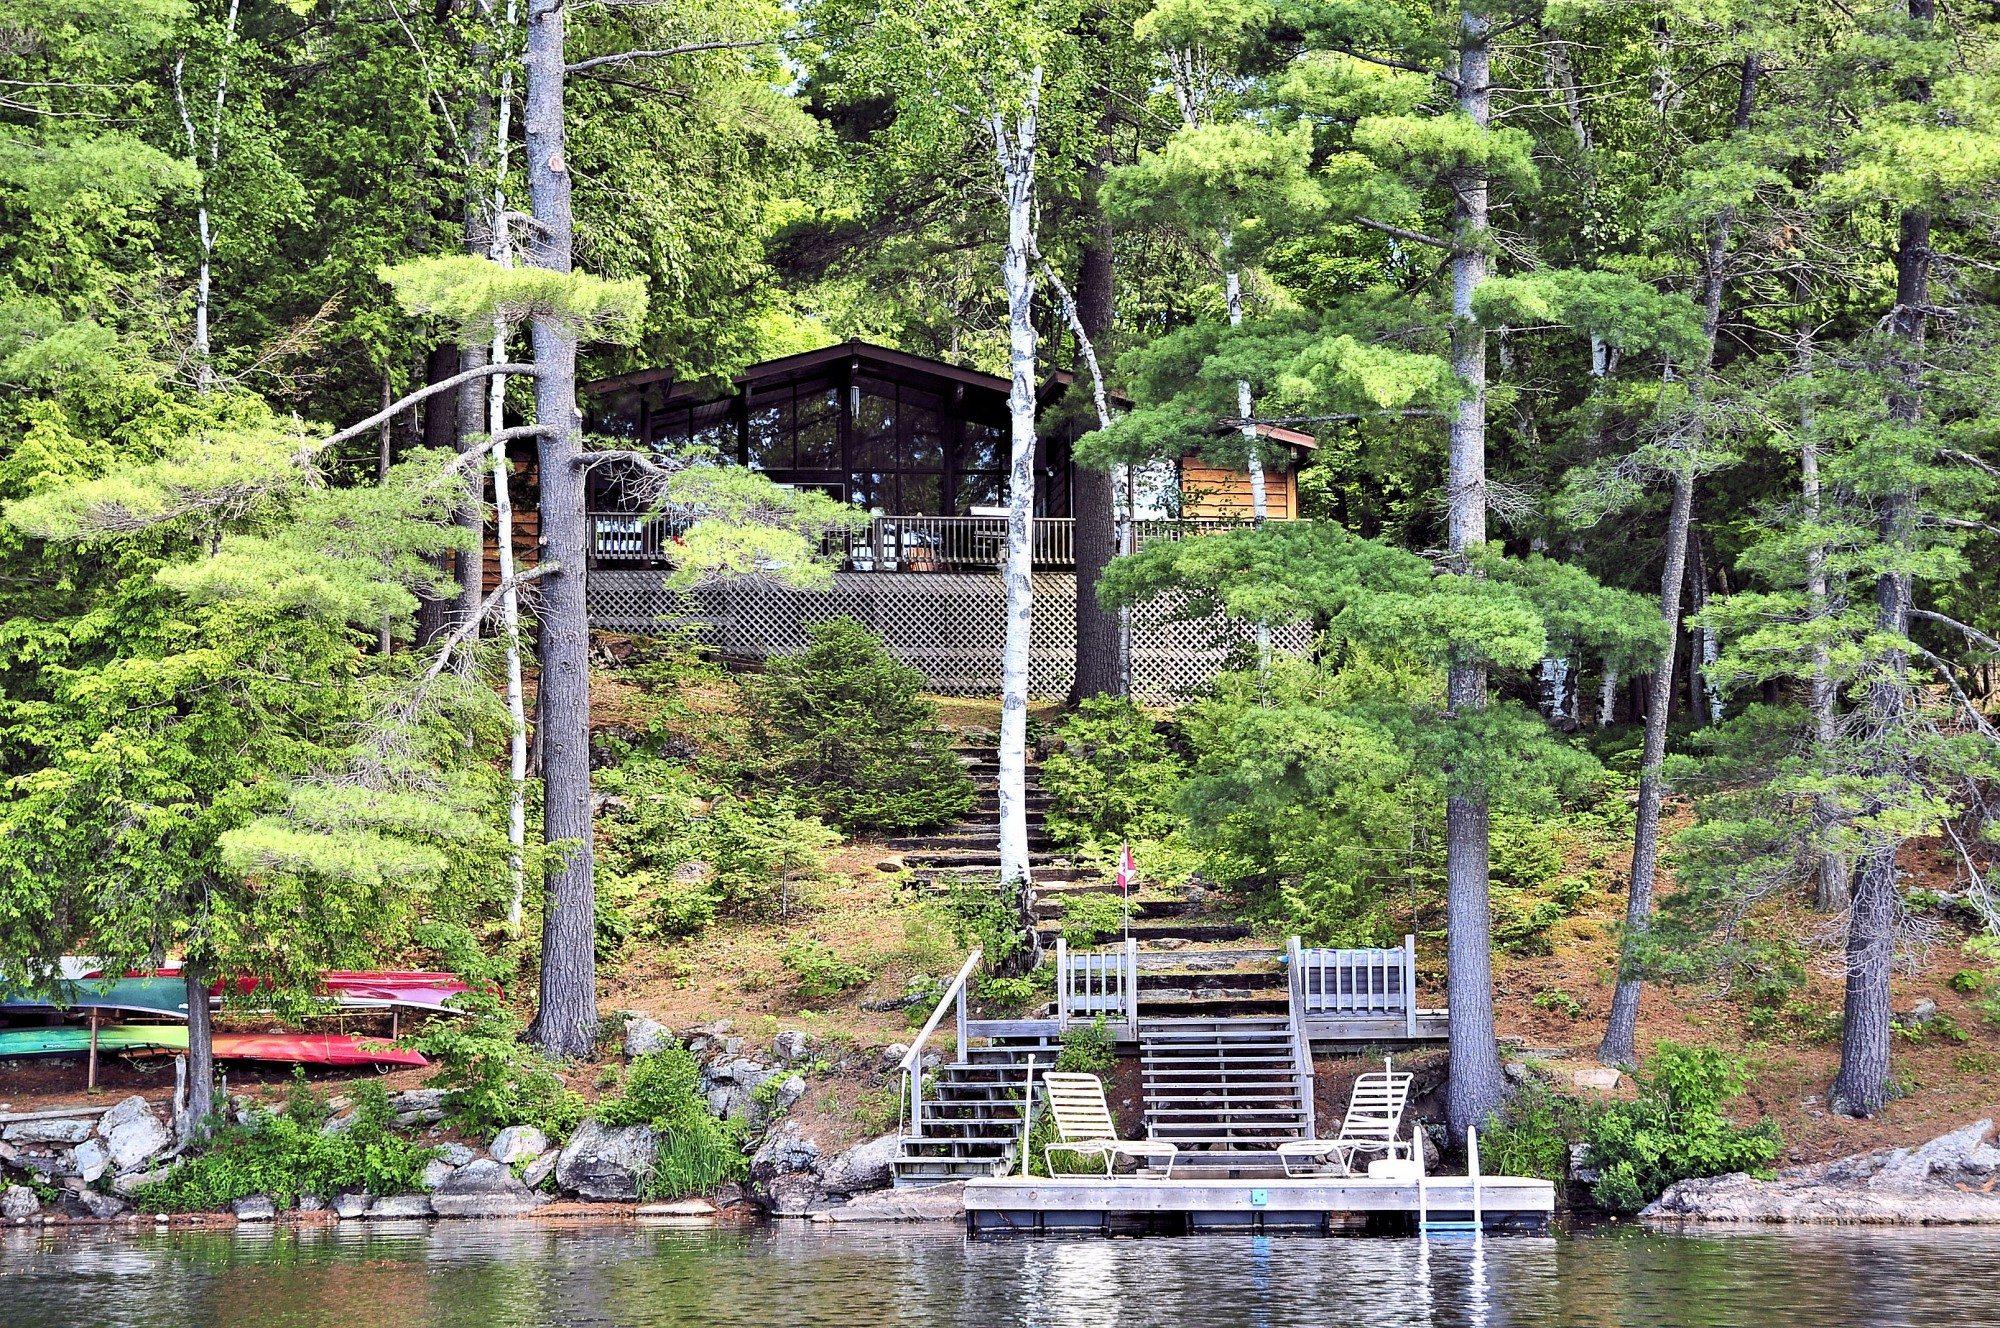 kawartha-lakes-cottage-for-sale-315-crego-lake-road-12